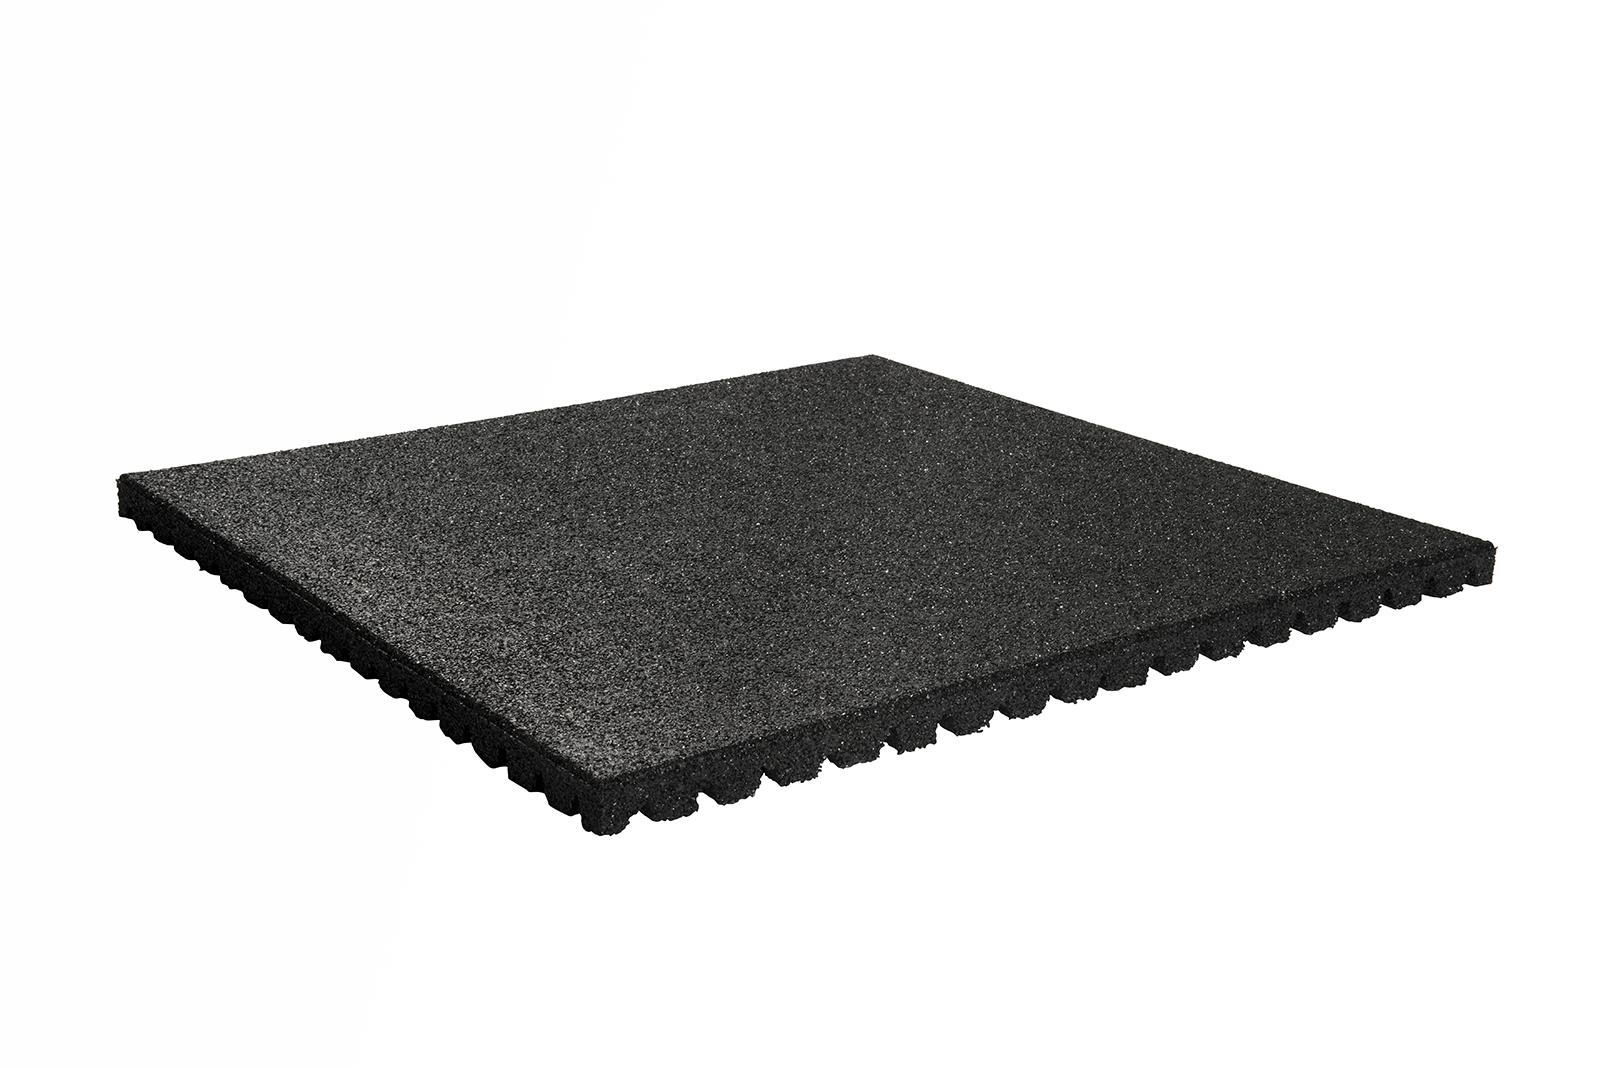 Granuflex Rubber Crossfit Gym Safety Flooring 43mm